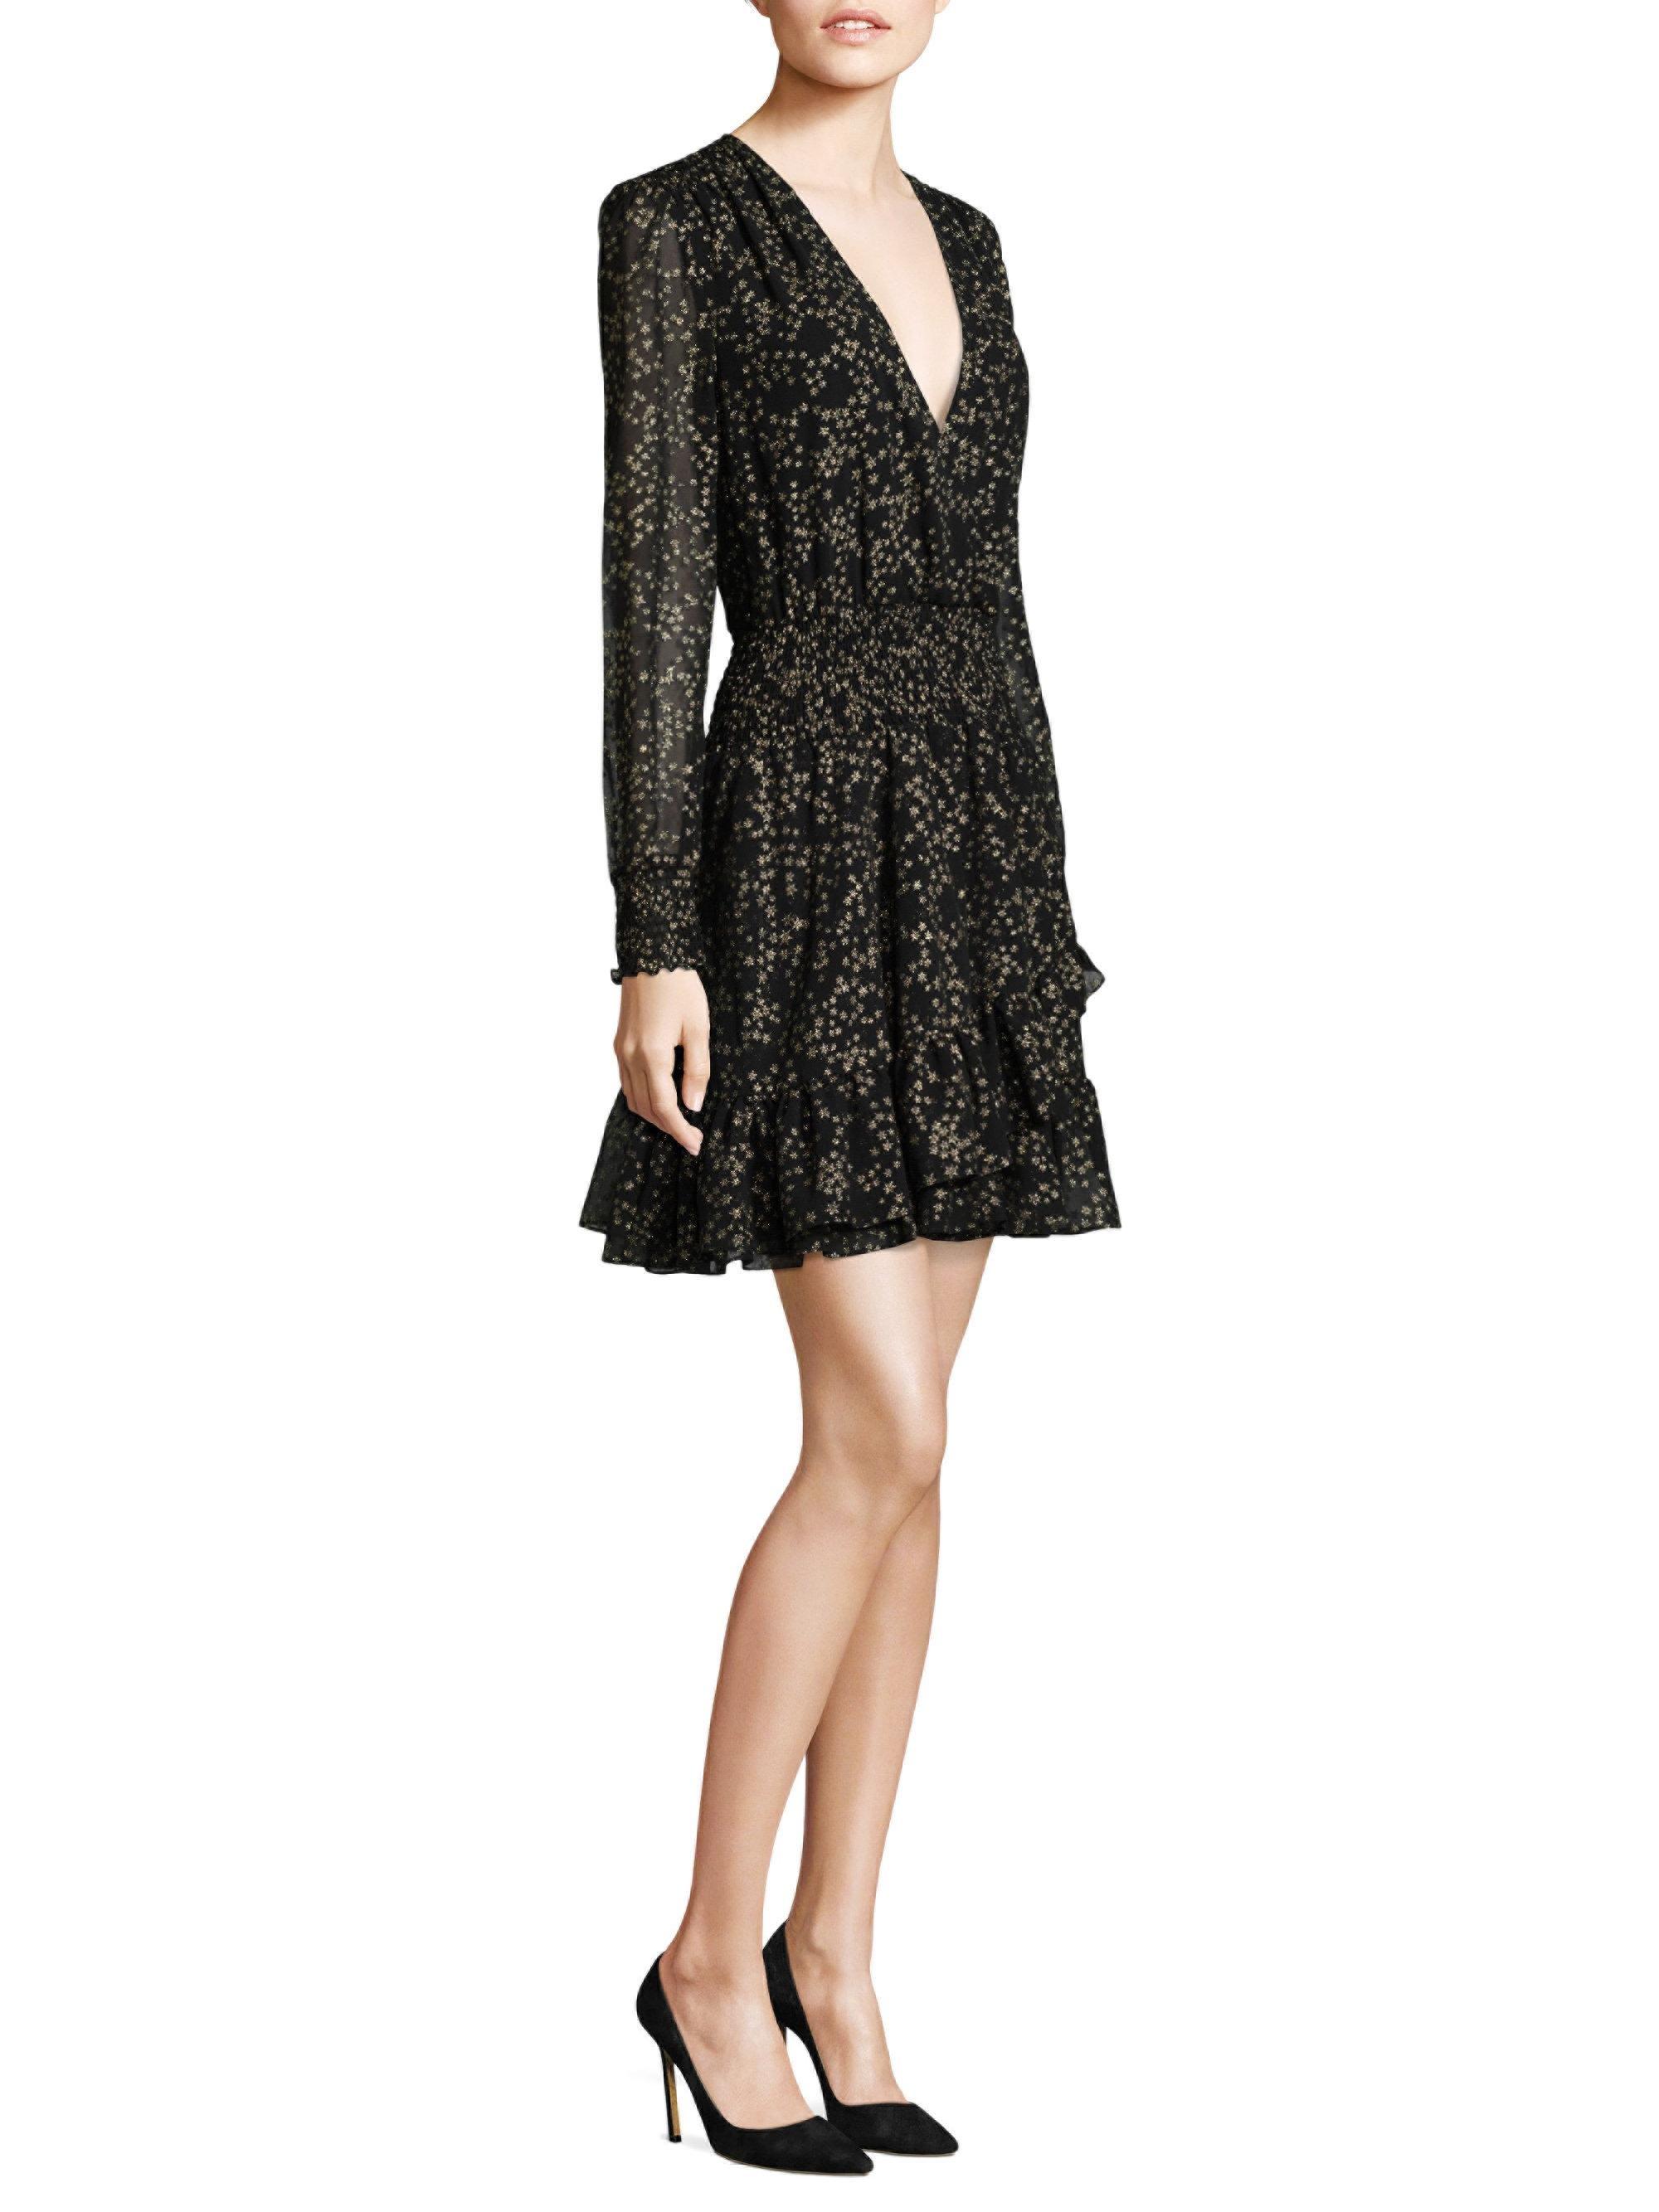 8ae26bf6cd7 MICHAEL Michael Kors Shooting Star Foil A-line Dress in Black - Lyst